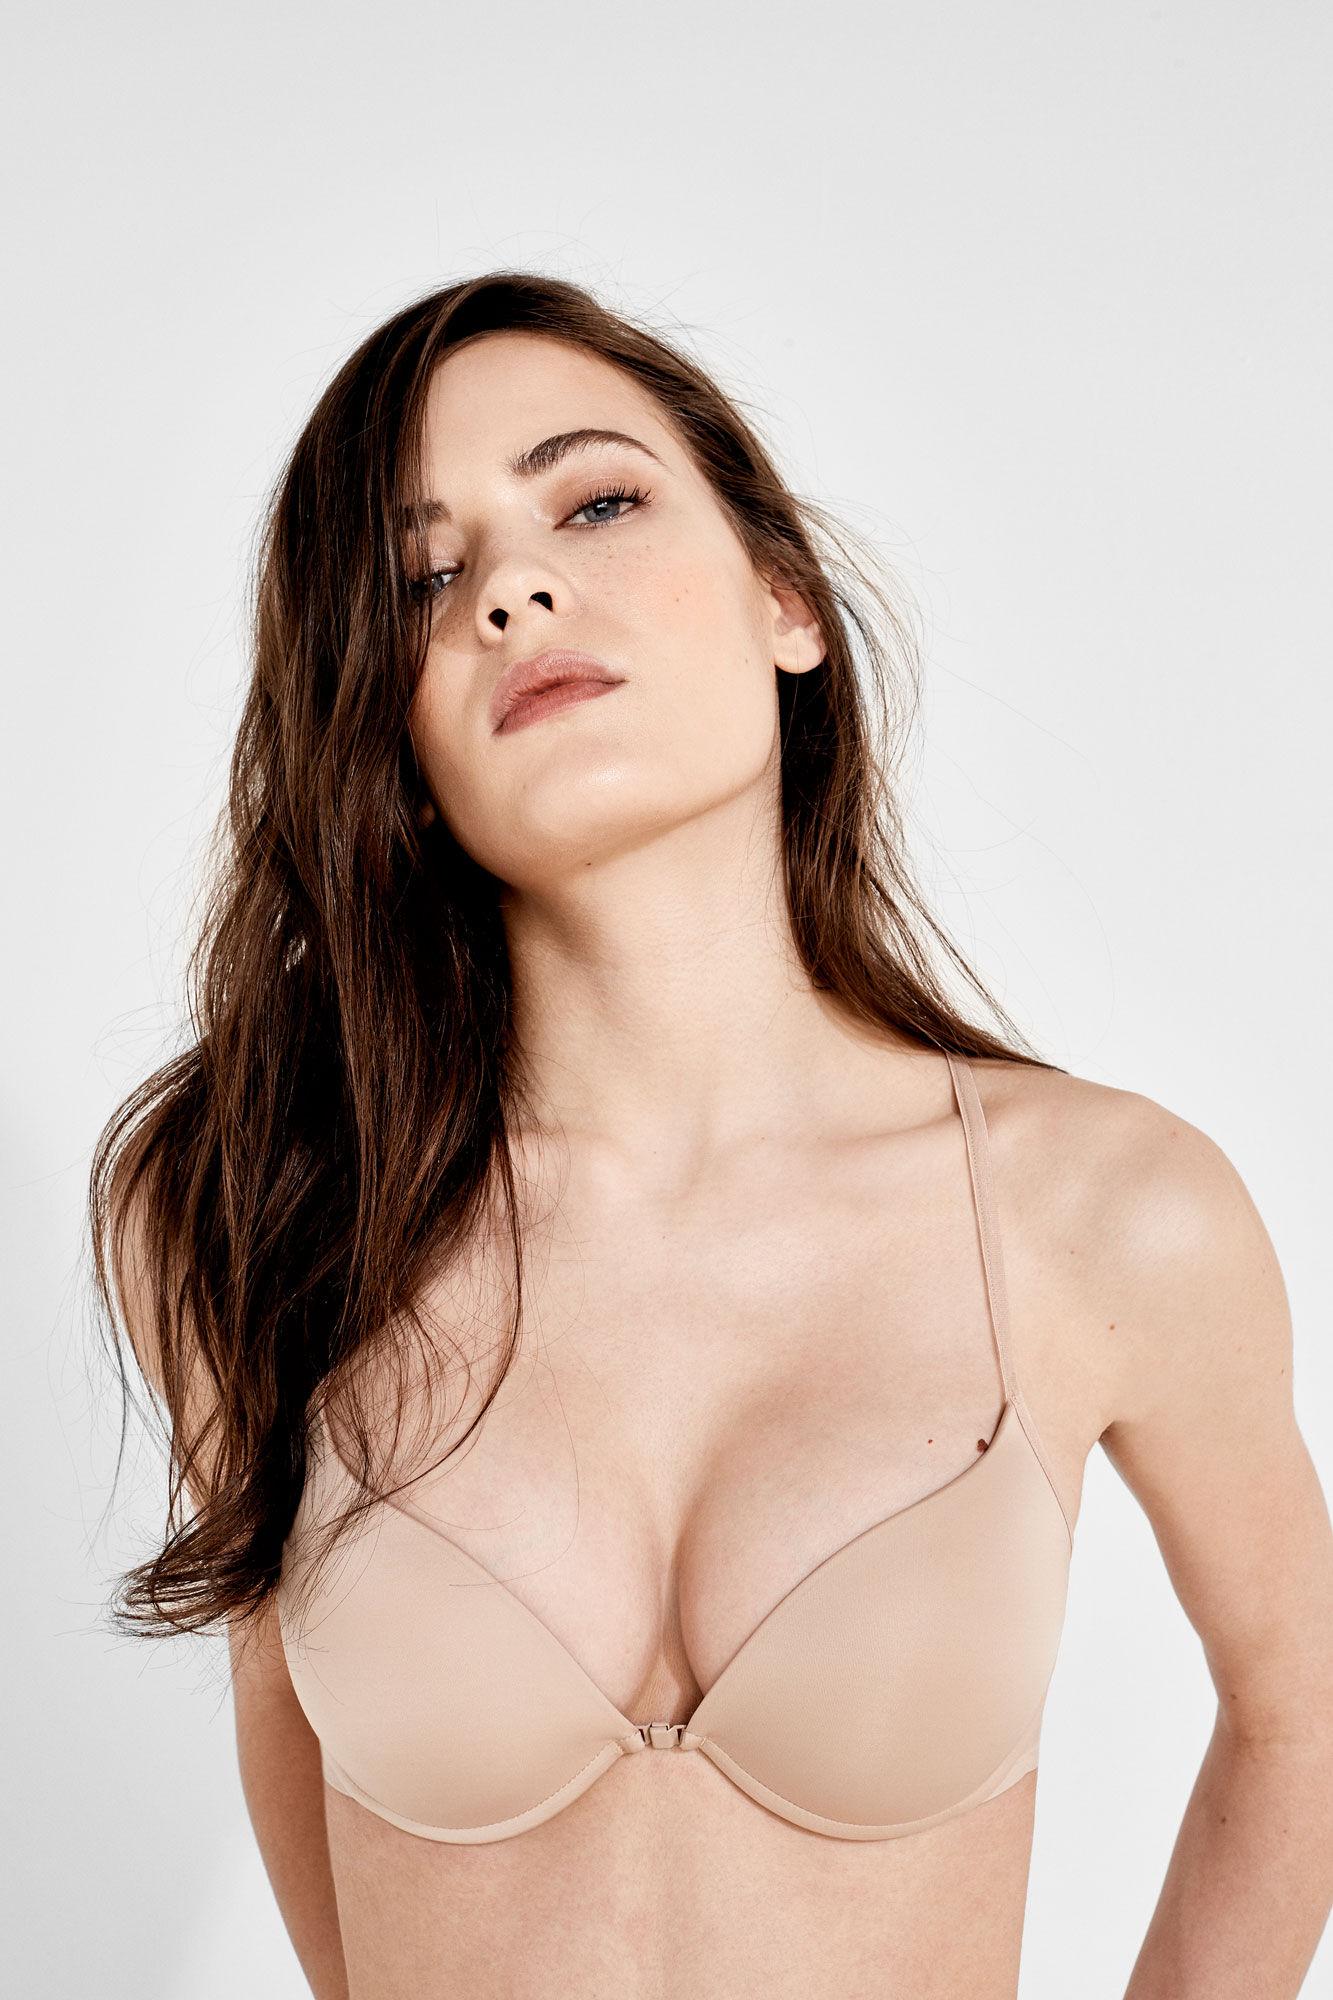 Pamela sucking tits